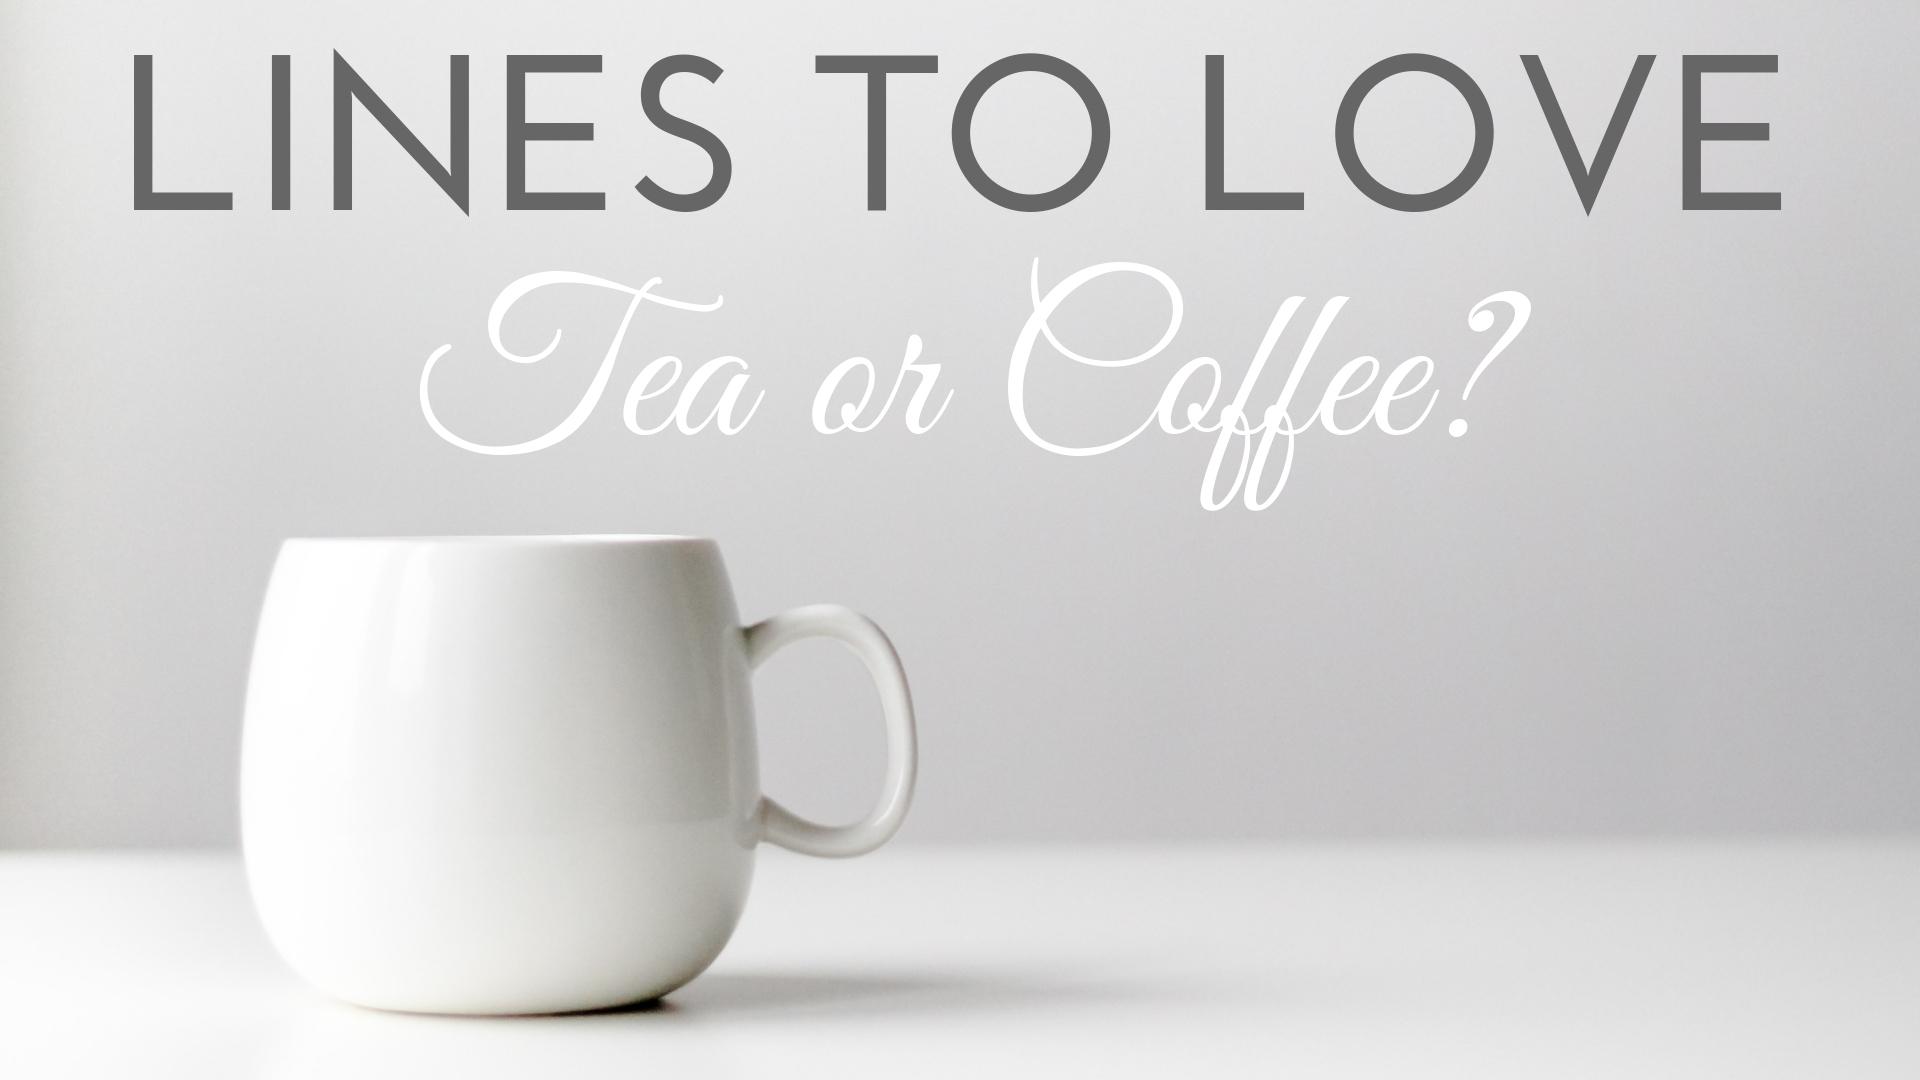 banner-lines-to-love-tea-or-coffee-03.jpg